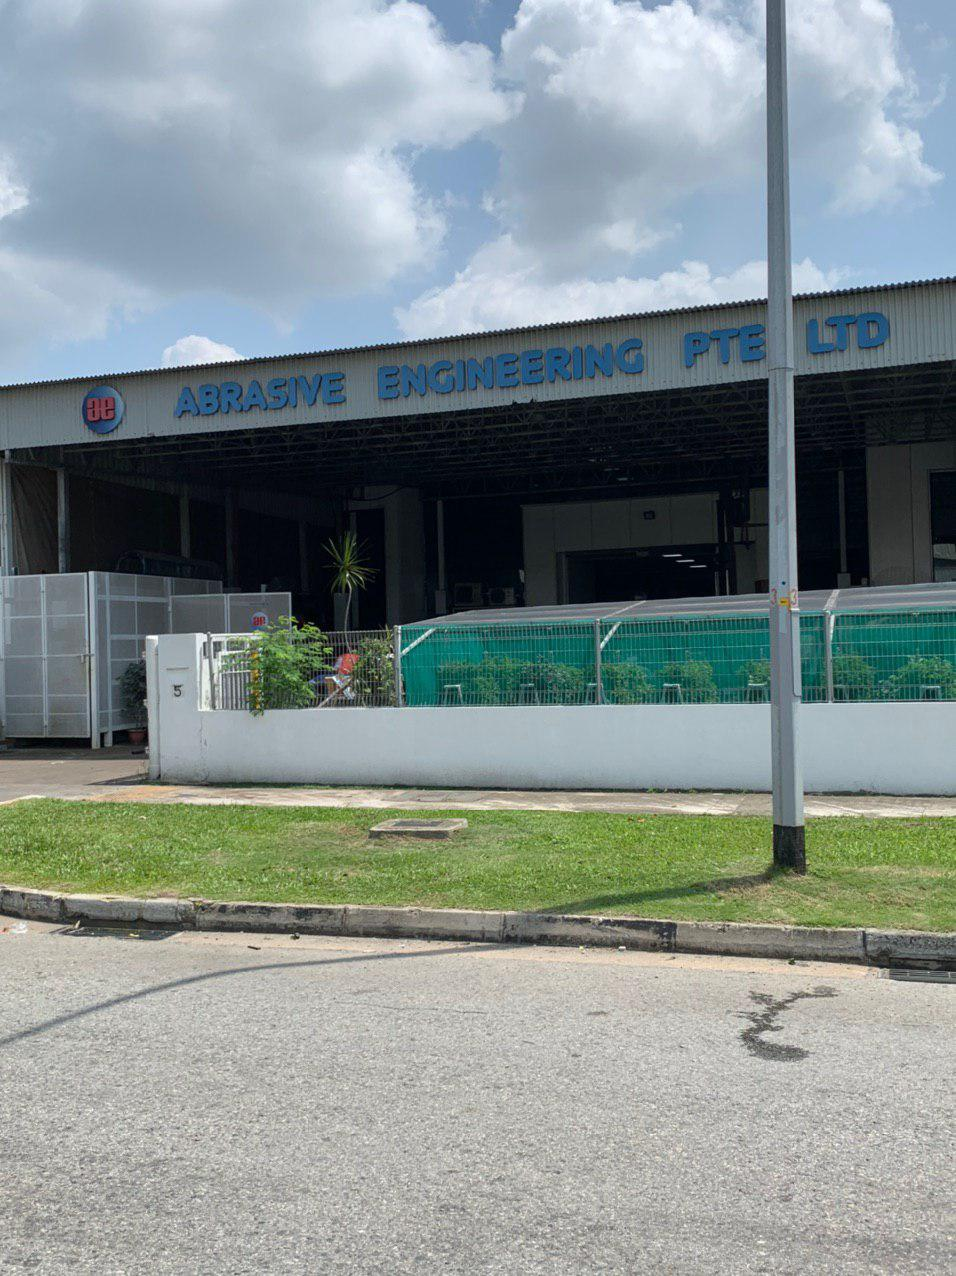 Abrasive Engineering Pte Ltd